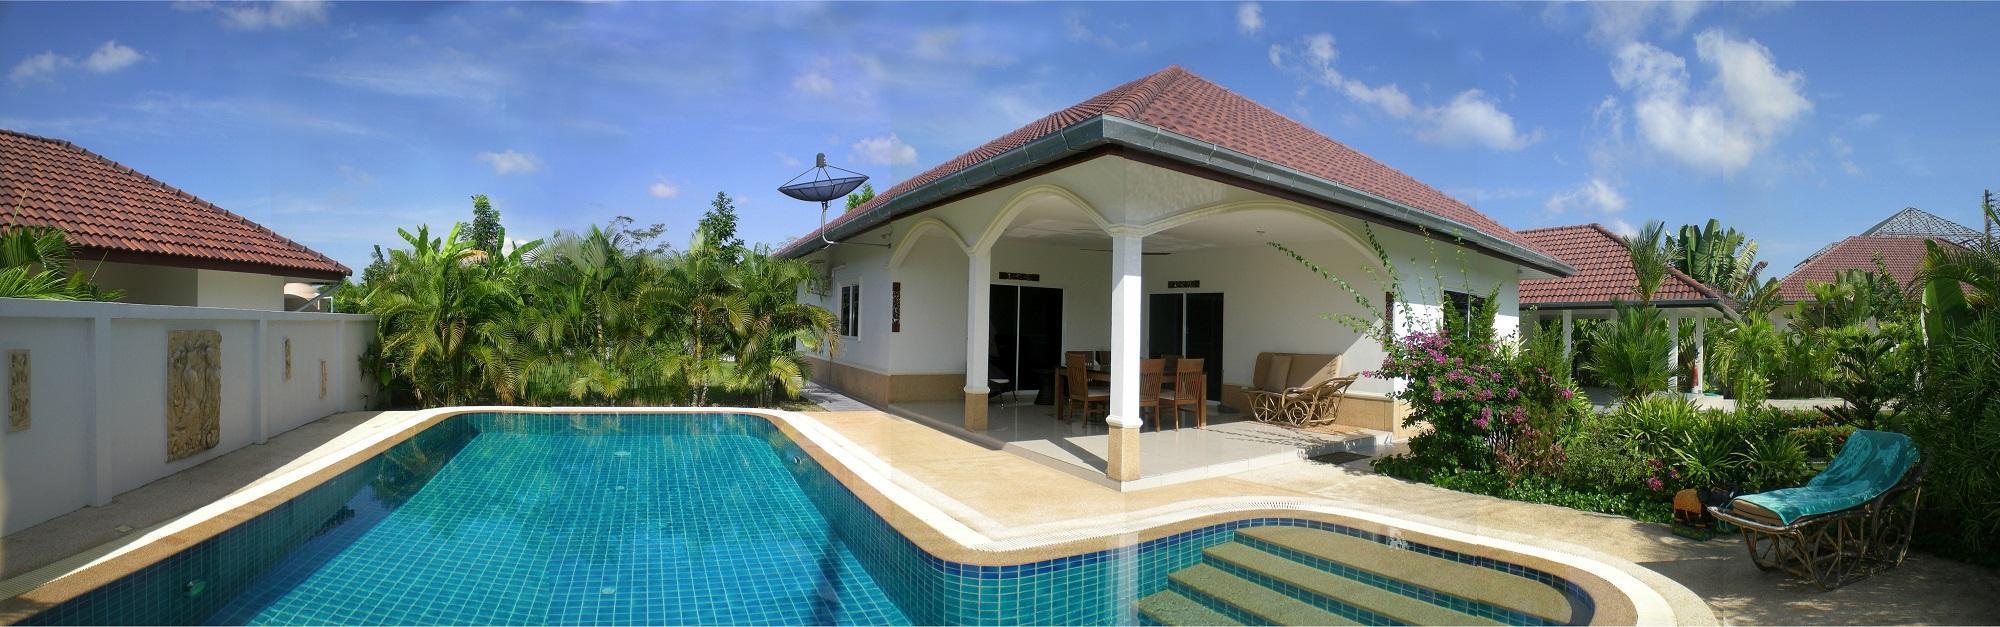 Luxueuse  villa 3 chambres,, avec piscine Luxueuse  villa 3 chambres,, avec piscine